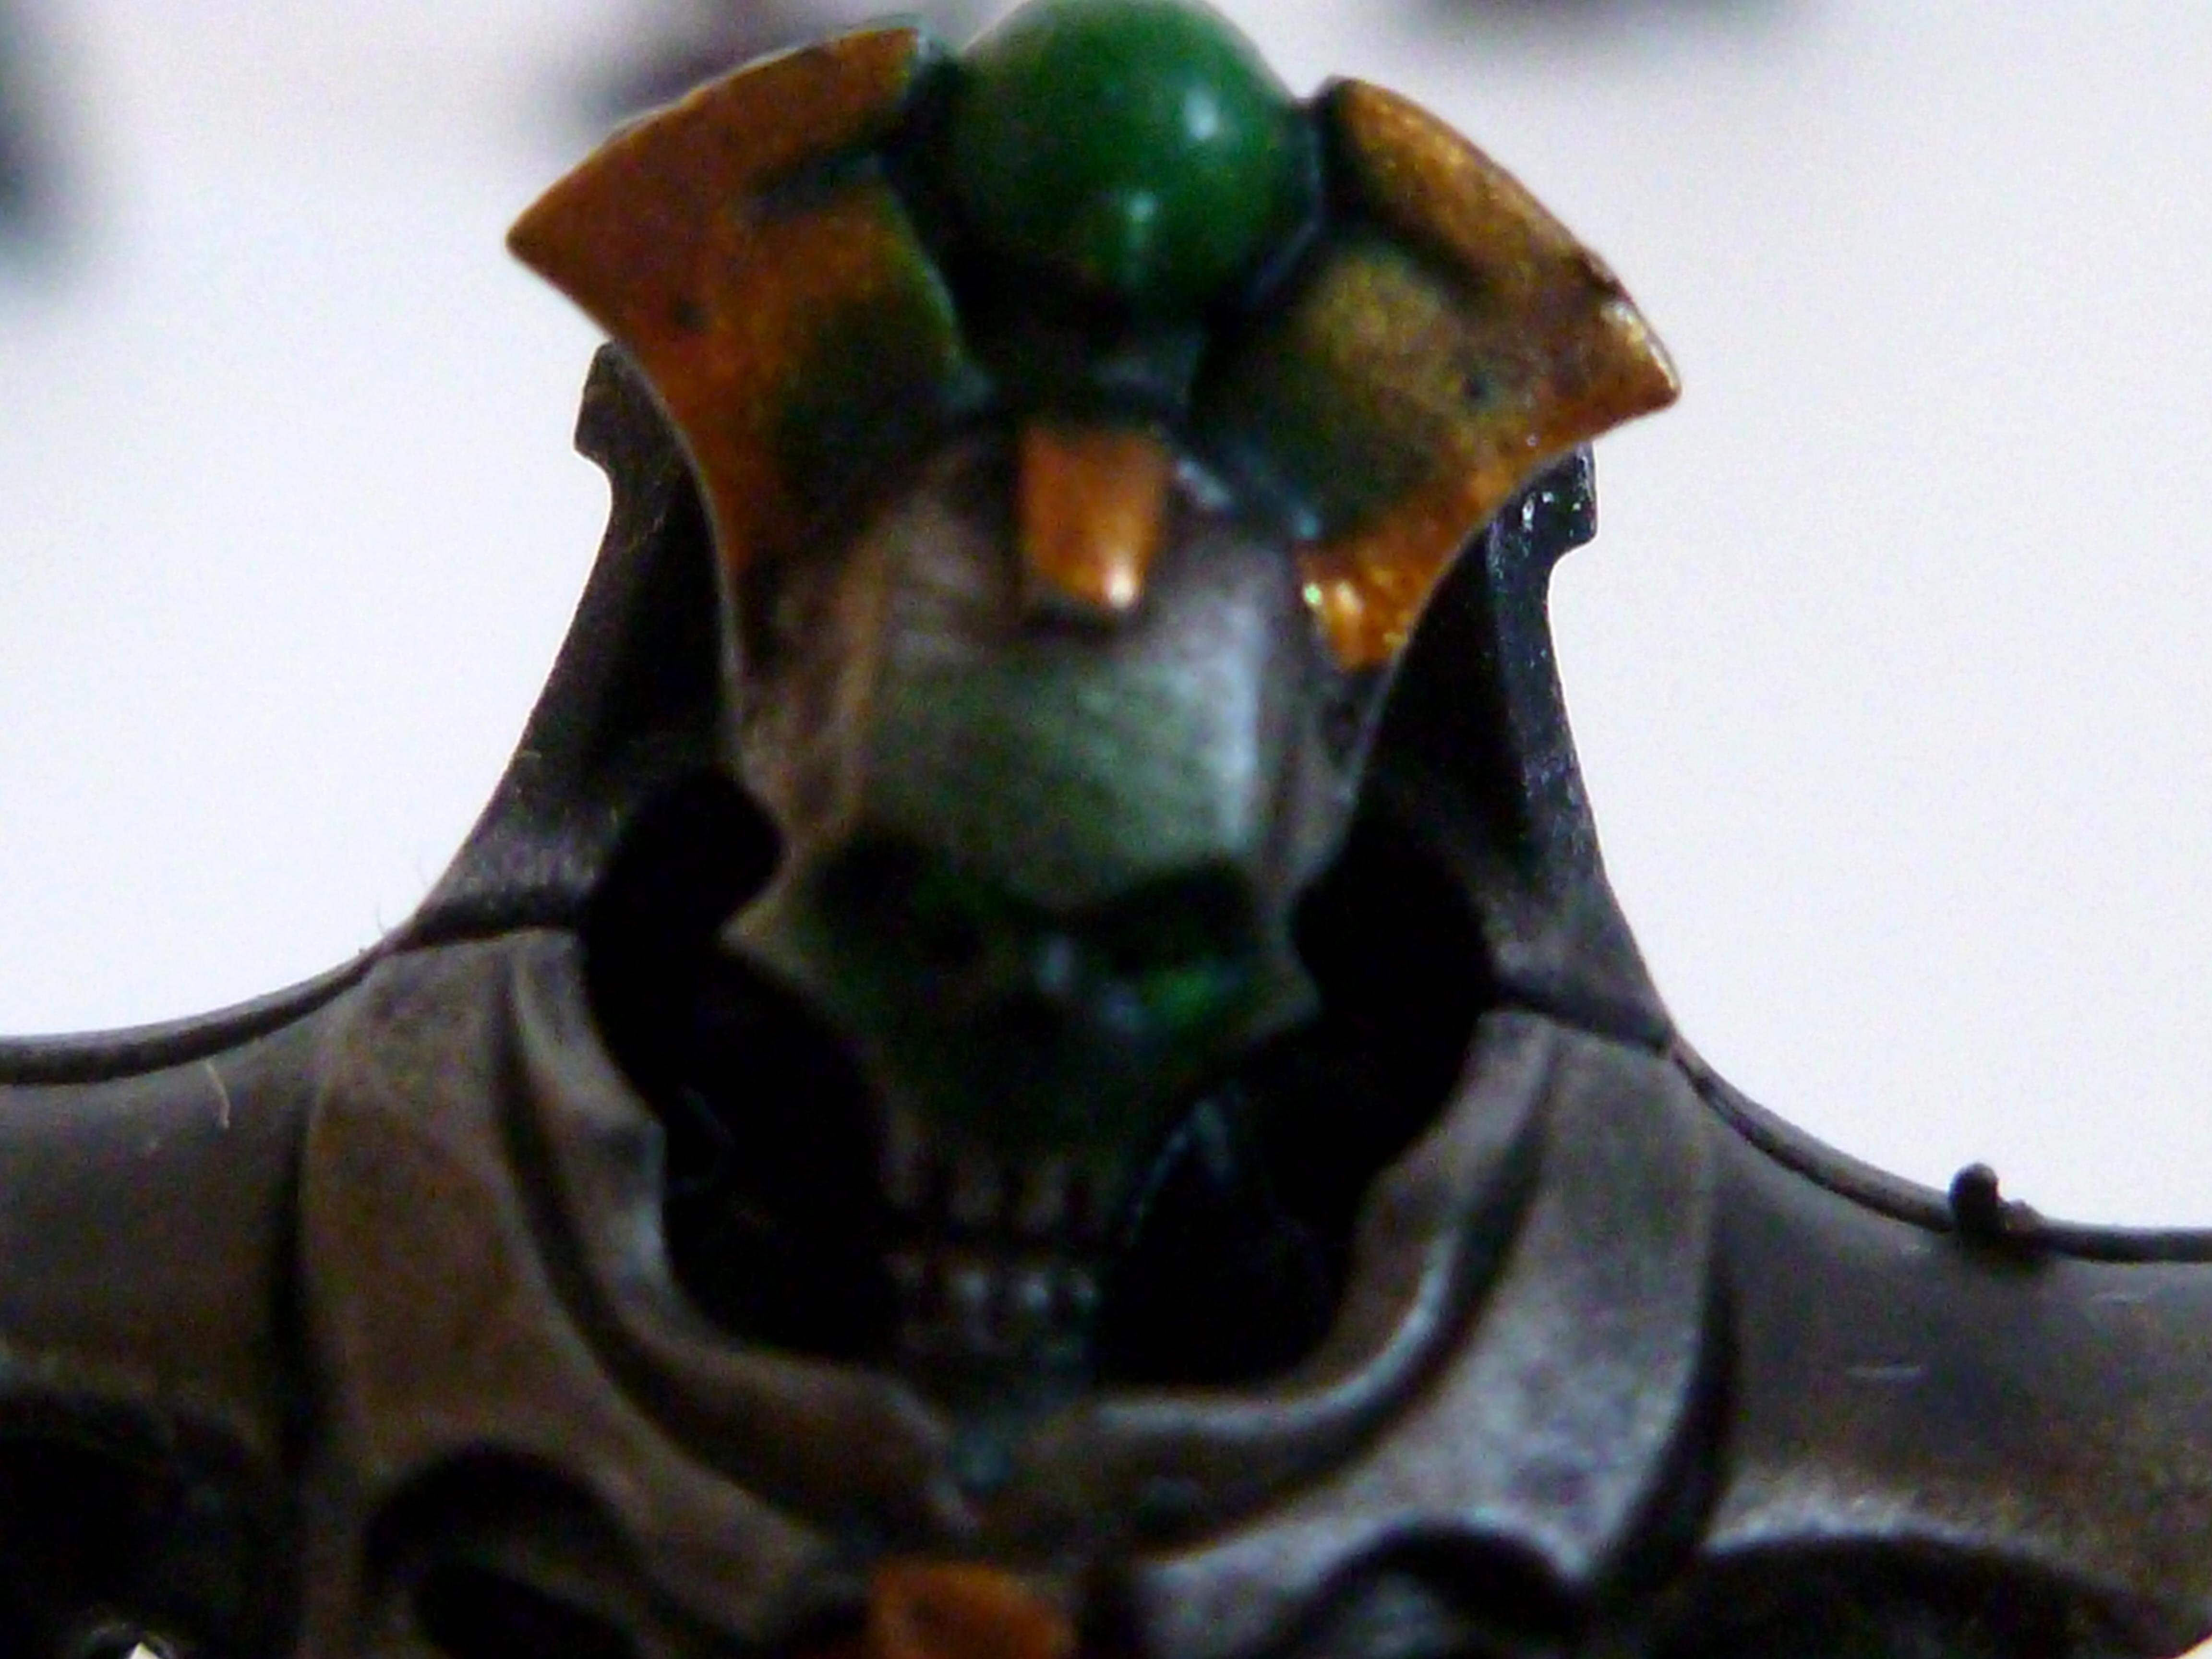 Base, Black, Cool, Disspersion Shild, Evil, Gauss, Gold, Green, Hyperphase Woerds, Lychgaurd, Metal, Necrons, Red, Shilds